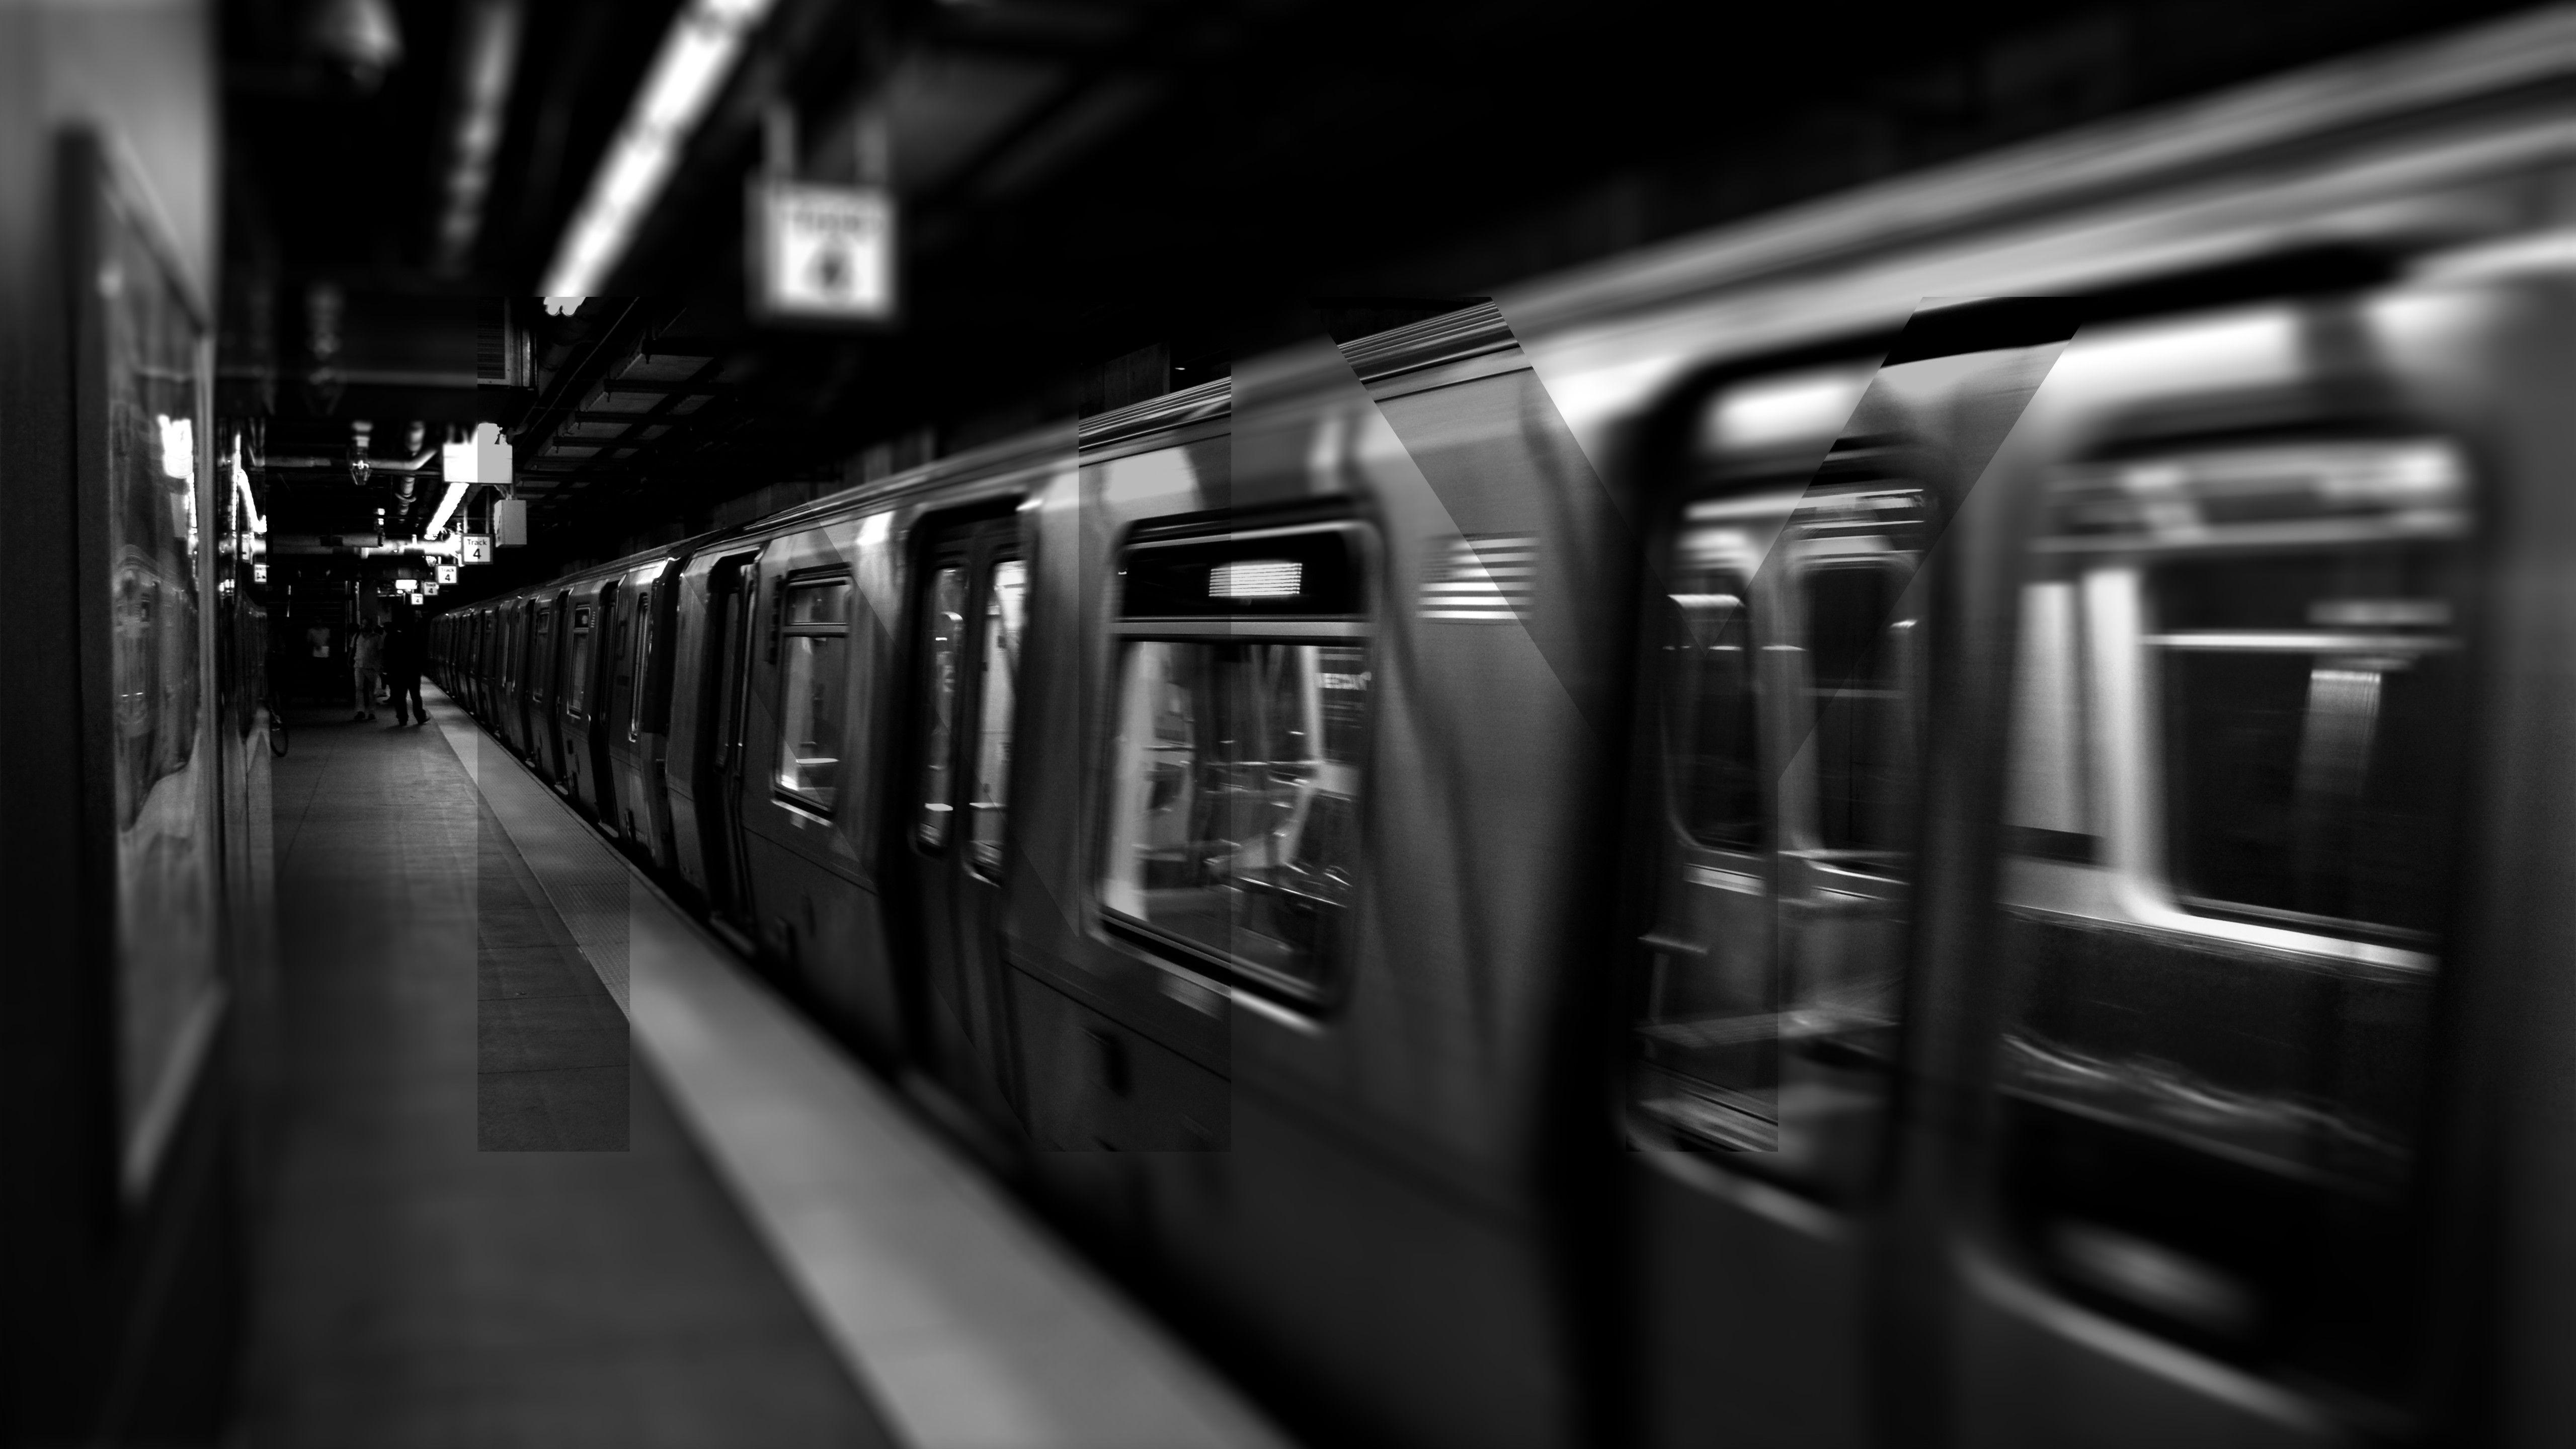 General 5120x2880 New York City Underground Subway Metro Train Monochrome Vehicle Train Wallpaper Subway Grayscale